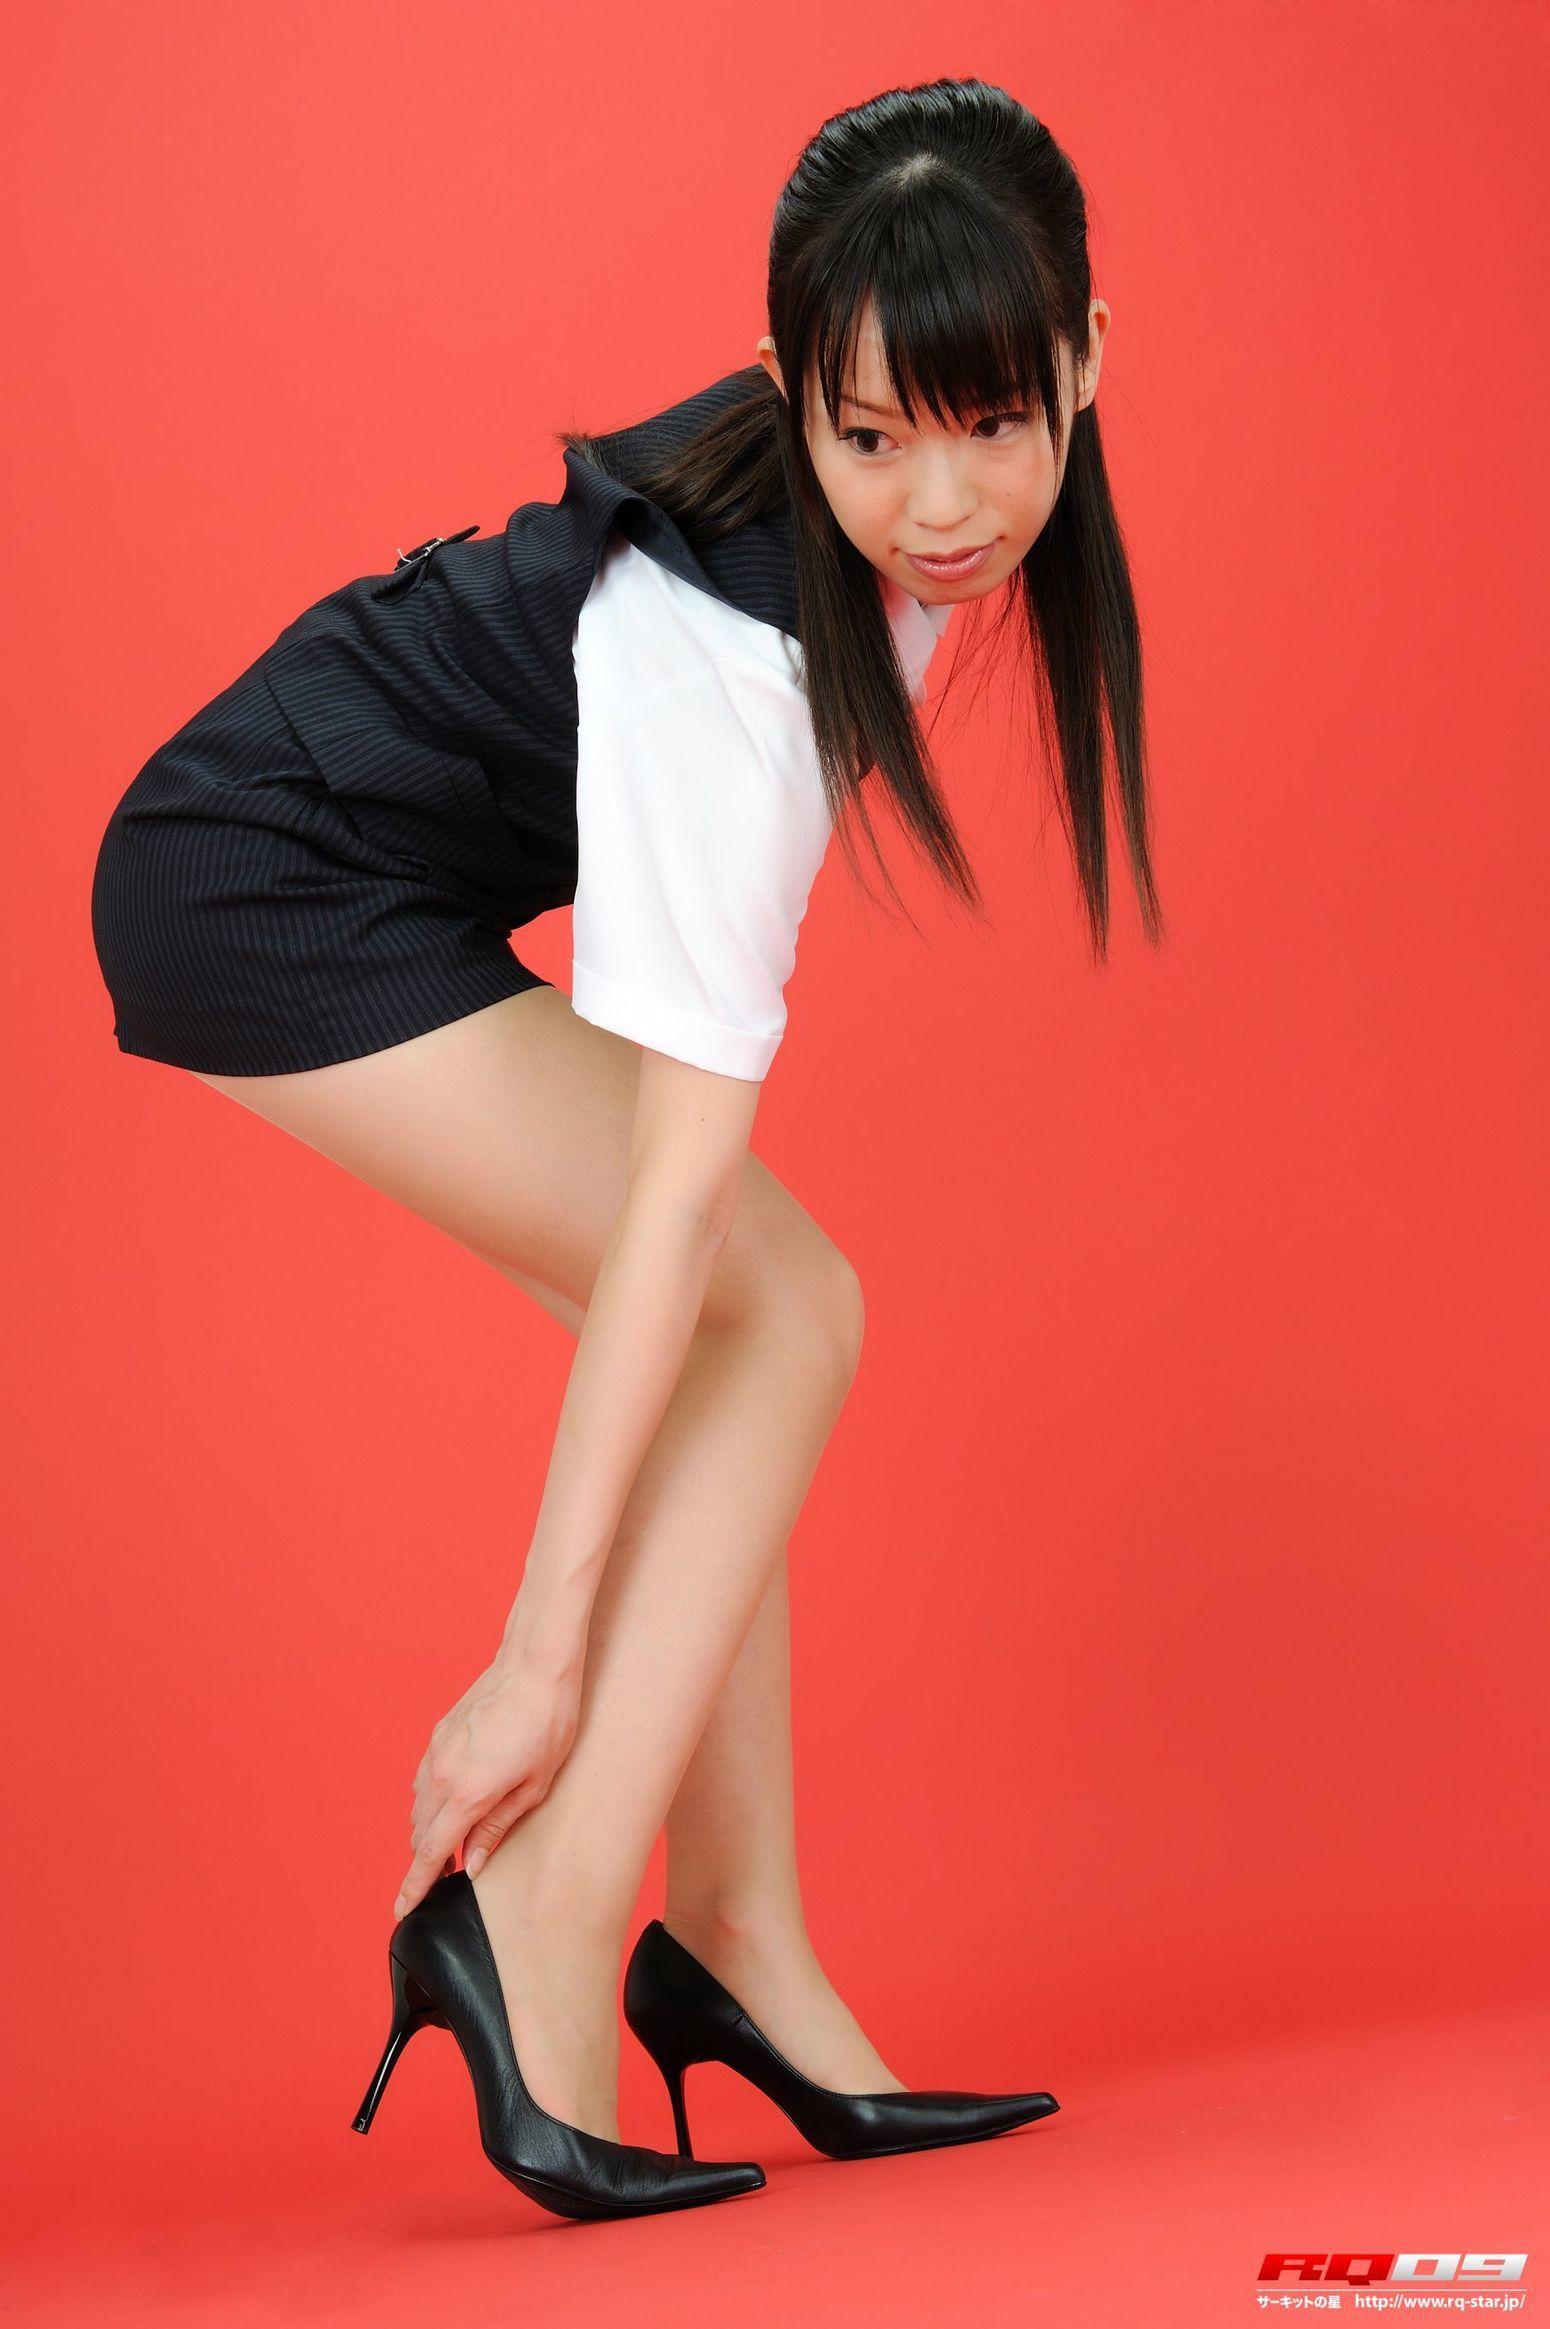 [RQ-STAR] NO.00193 Miyuki Koizumi 小泉みゆき Office Lady 写真集(87) -美女